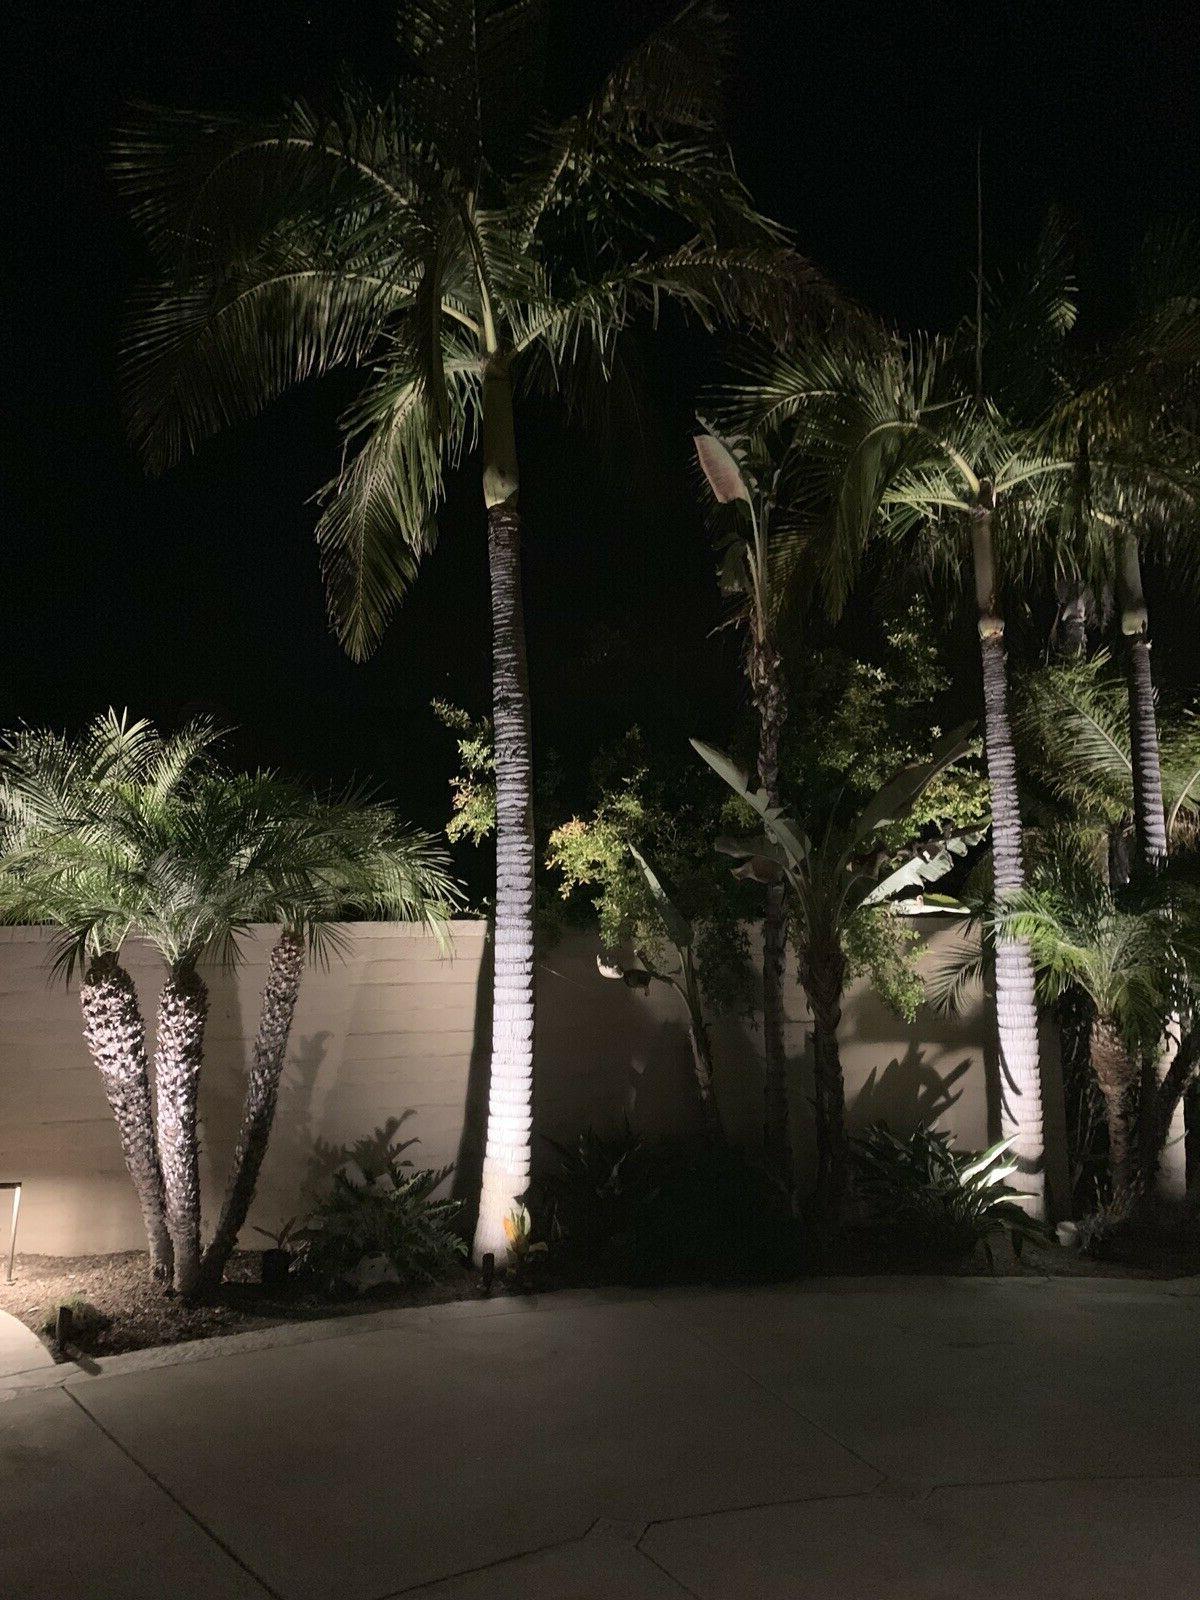 LED Low Voltage Spot Light - Landscape